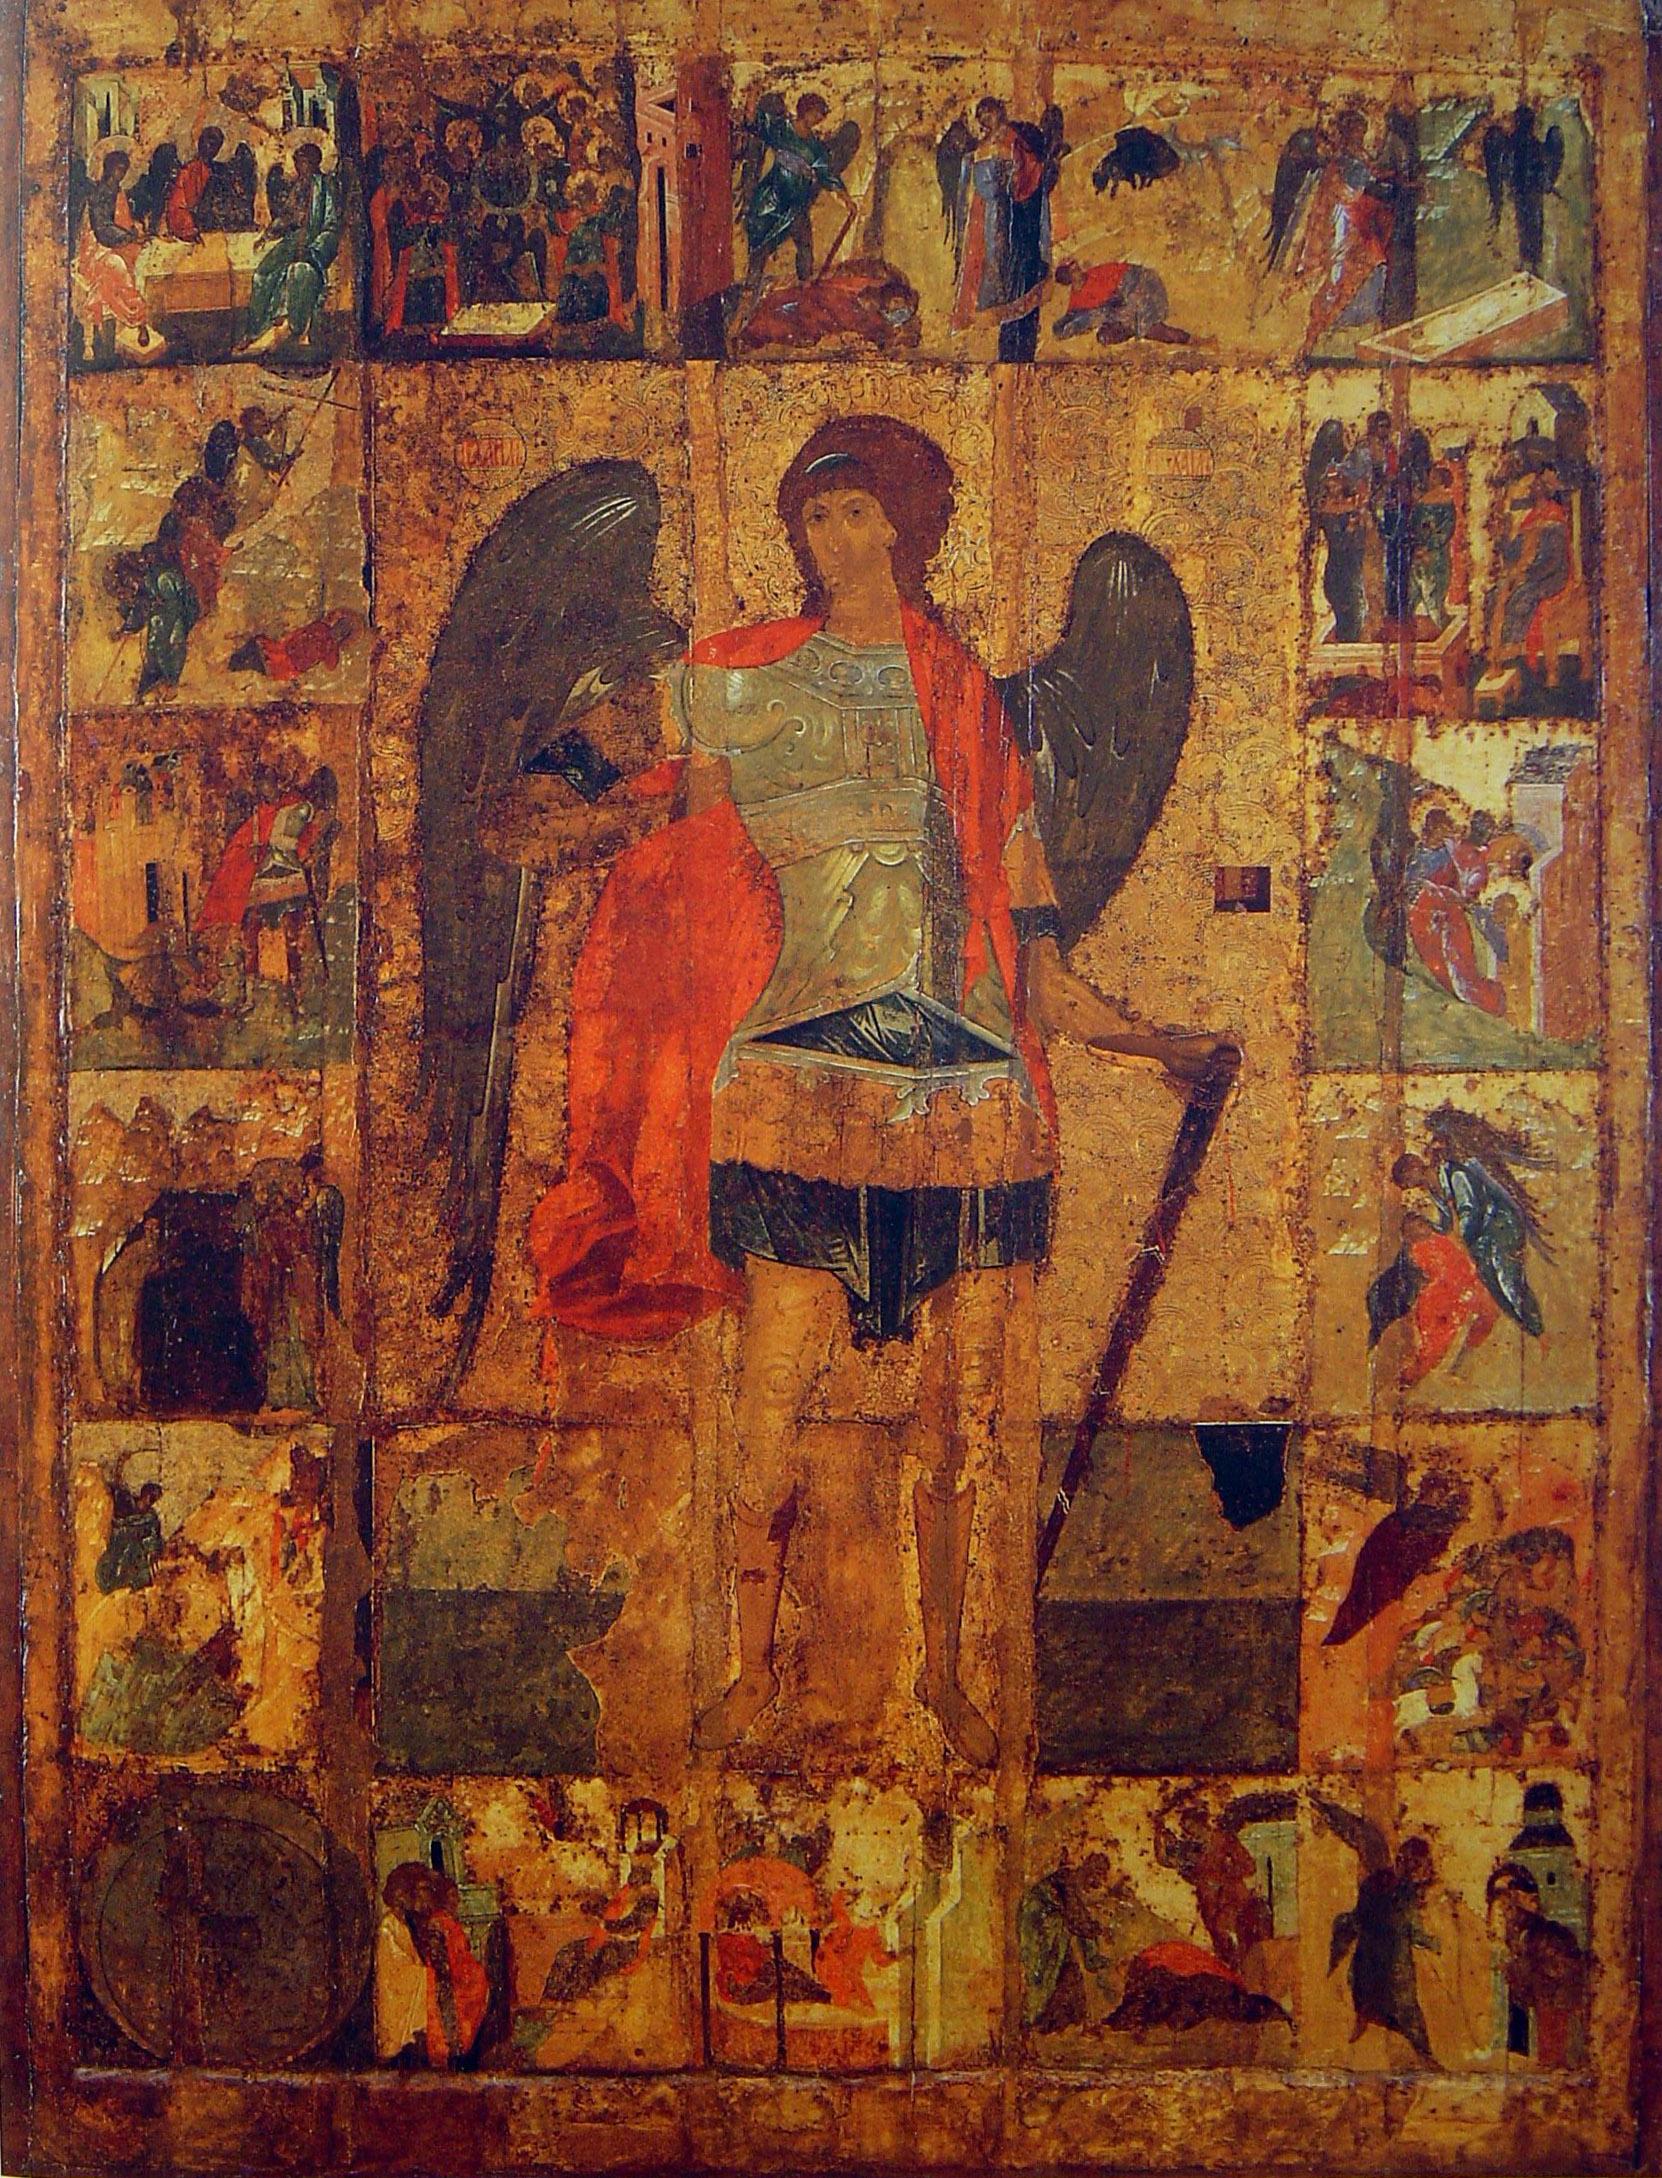 مَن رأى الملاك